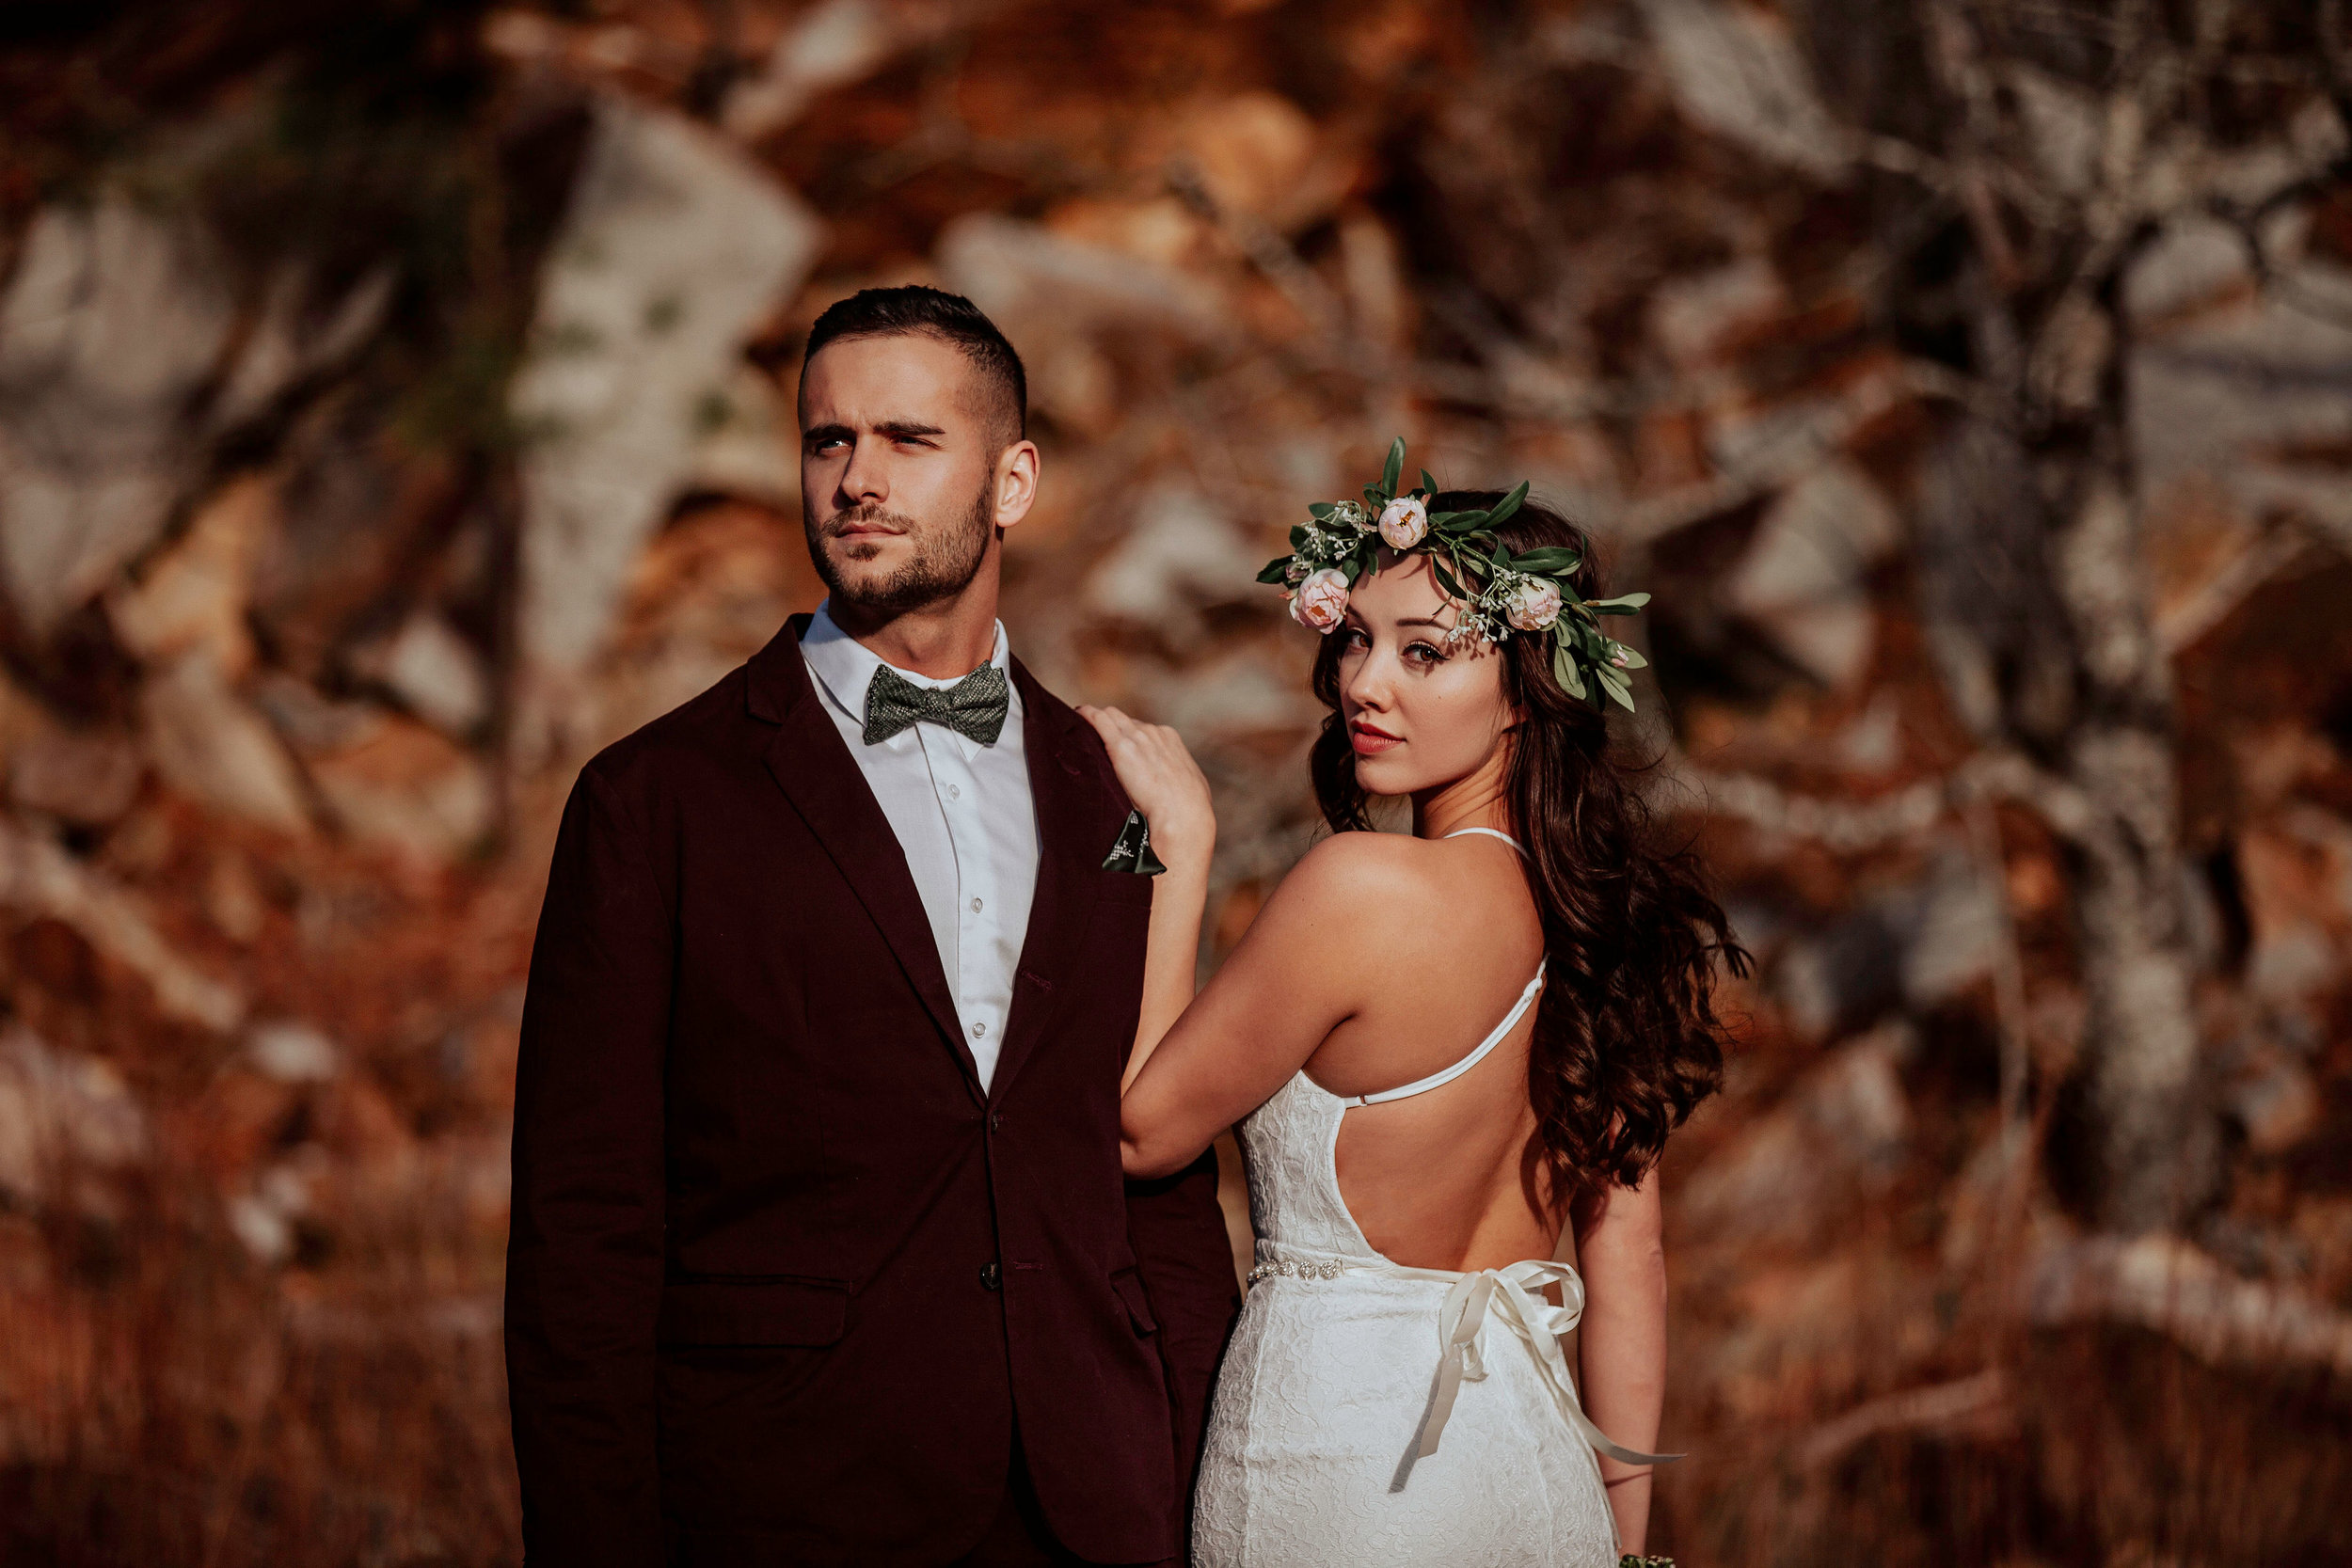 beauty-portrait-headshot-fashion-beauty-editorial-arkansas-bridal-photographer-little-rock-photography-outdoor-wedding-boho-fashion-engagement-elopement-bouquet-bride